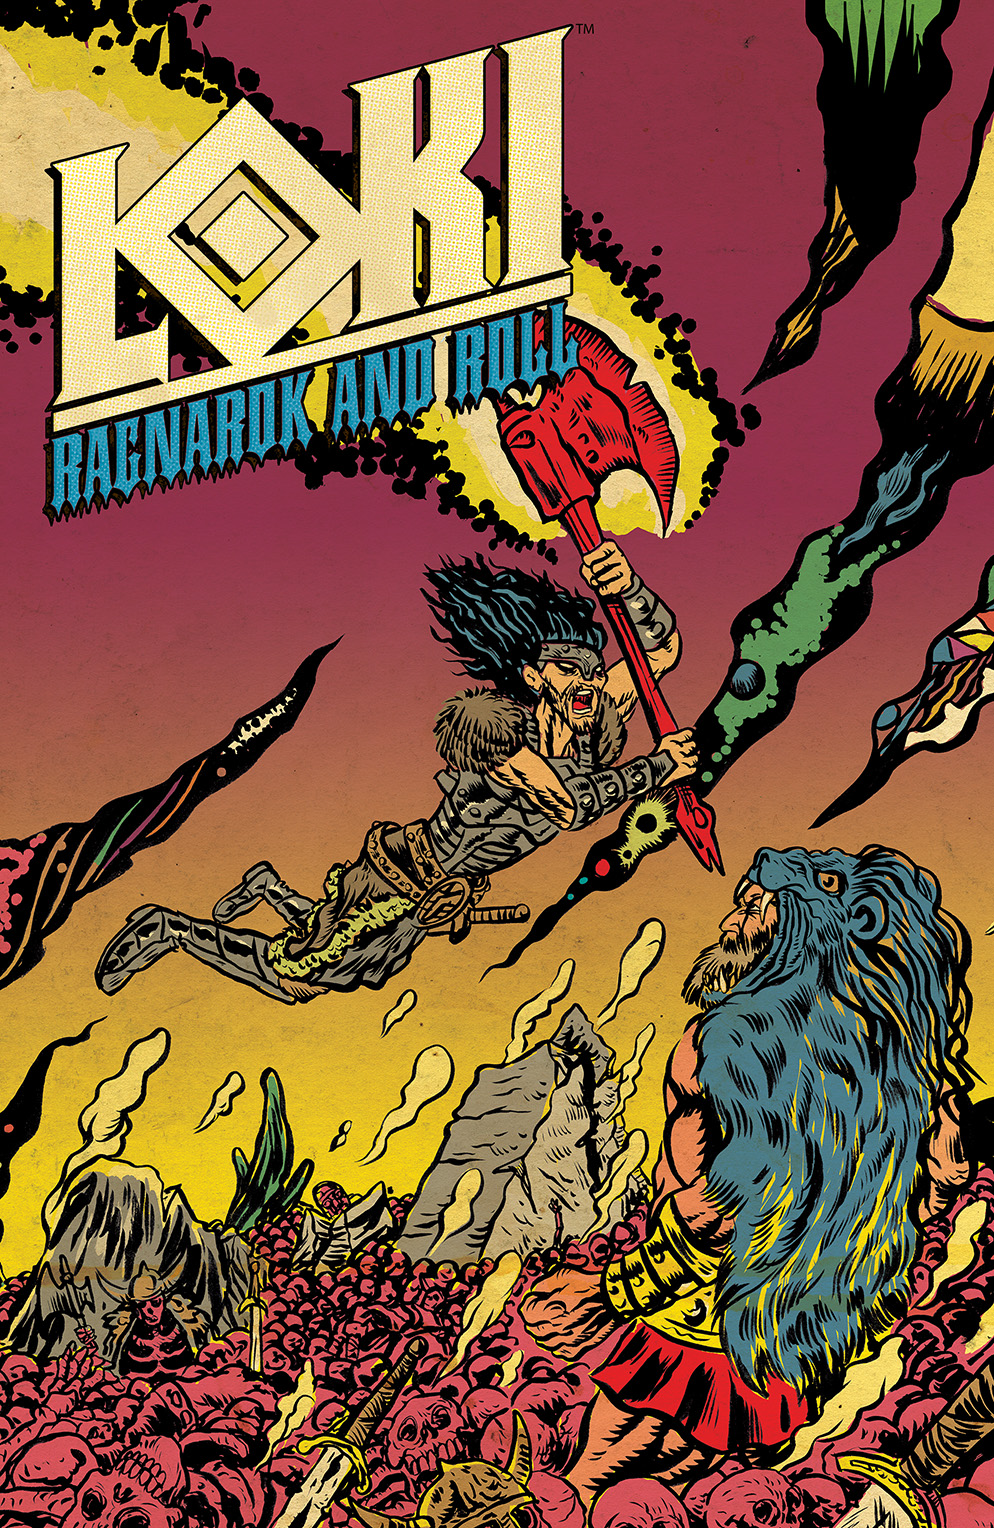 Loki: Ragnarok and Roll #3